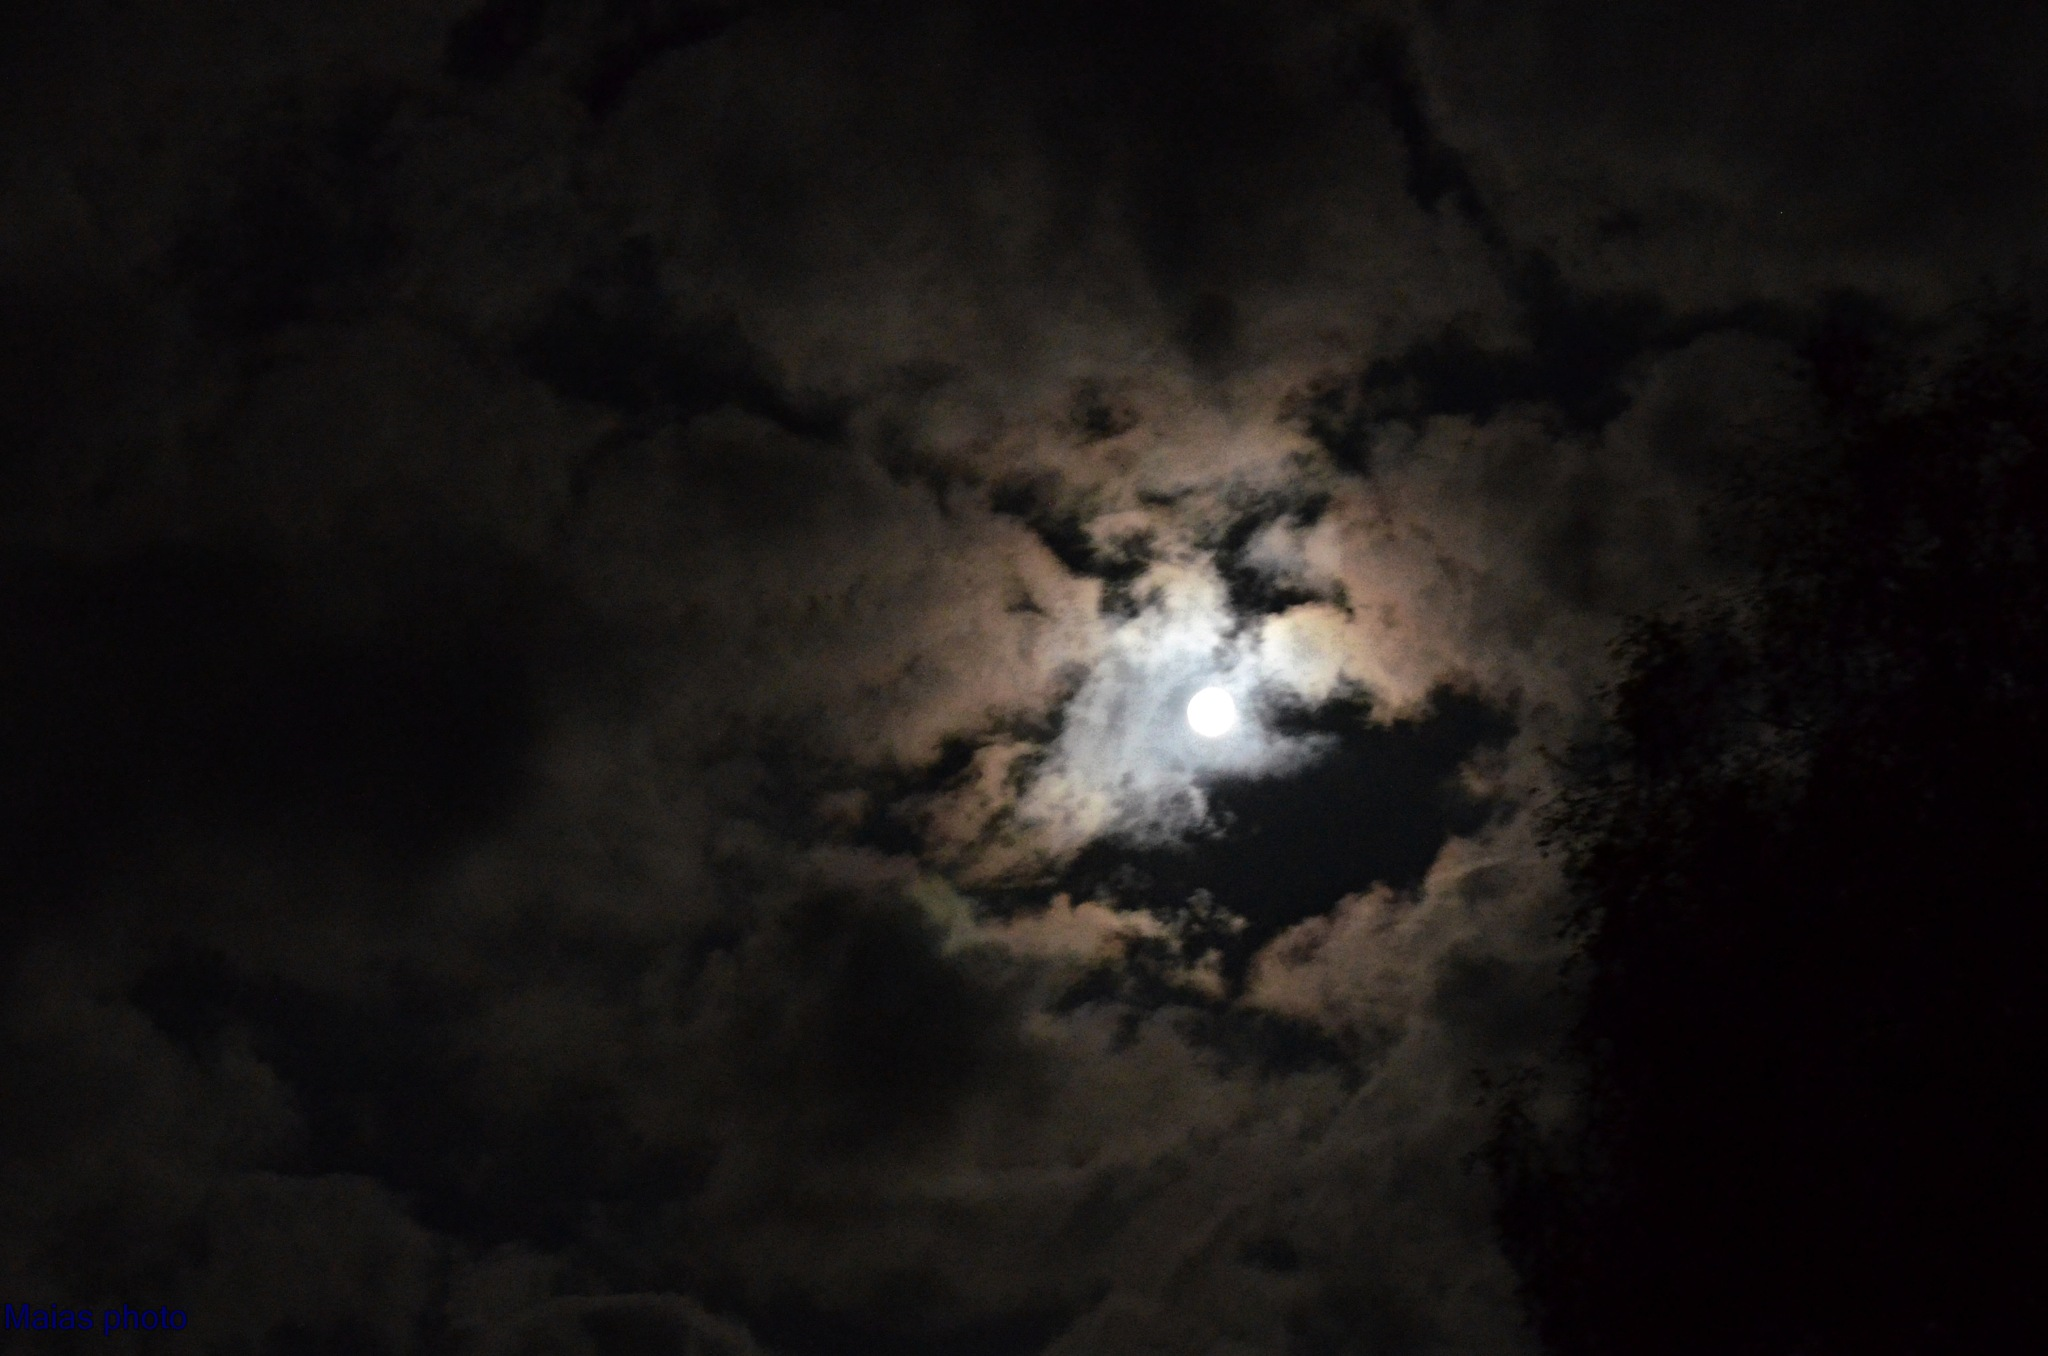 Hål i molnen by Maias photo